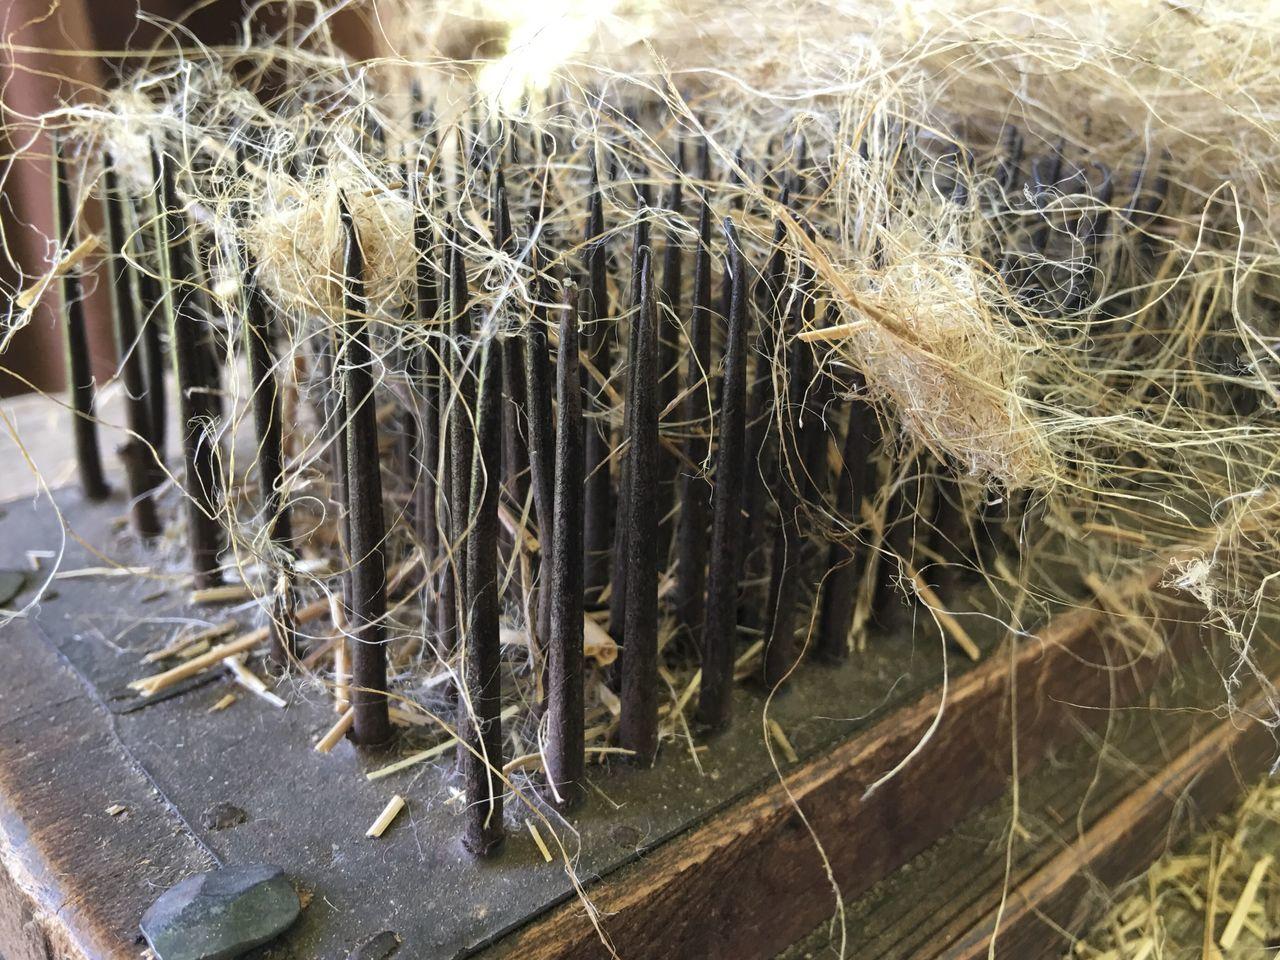 Flax Flax Plant Linen Colonial Era Nails Rustic Beauty